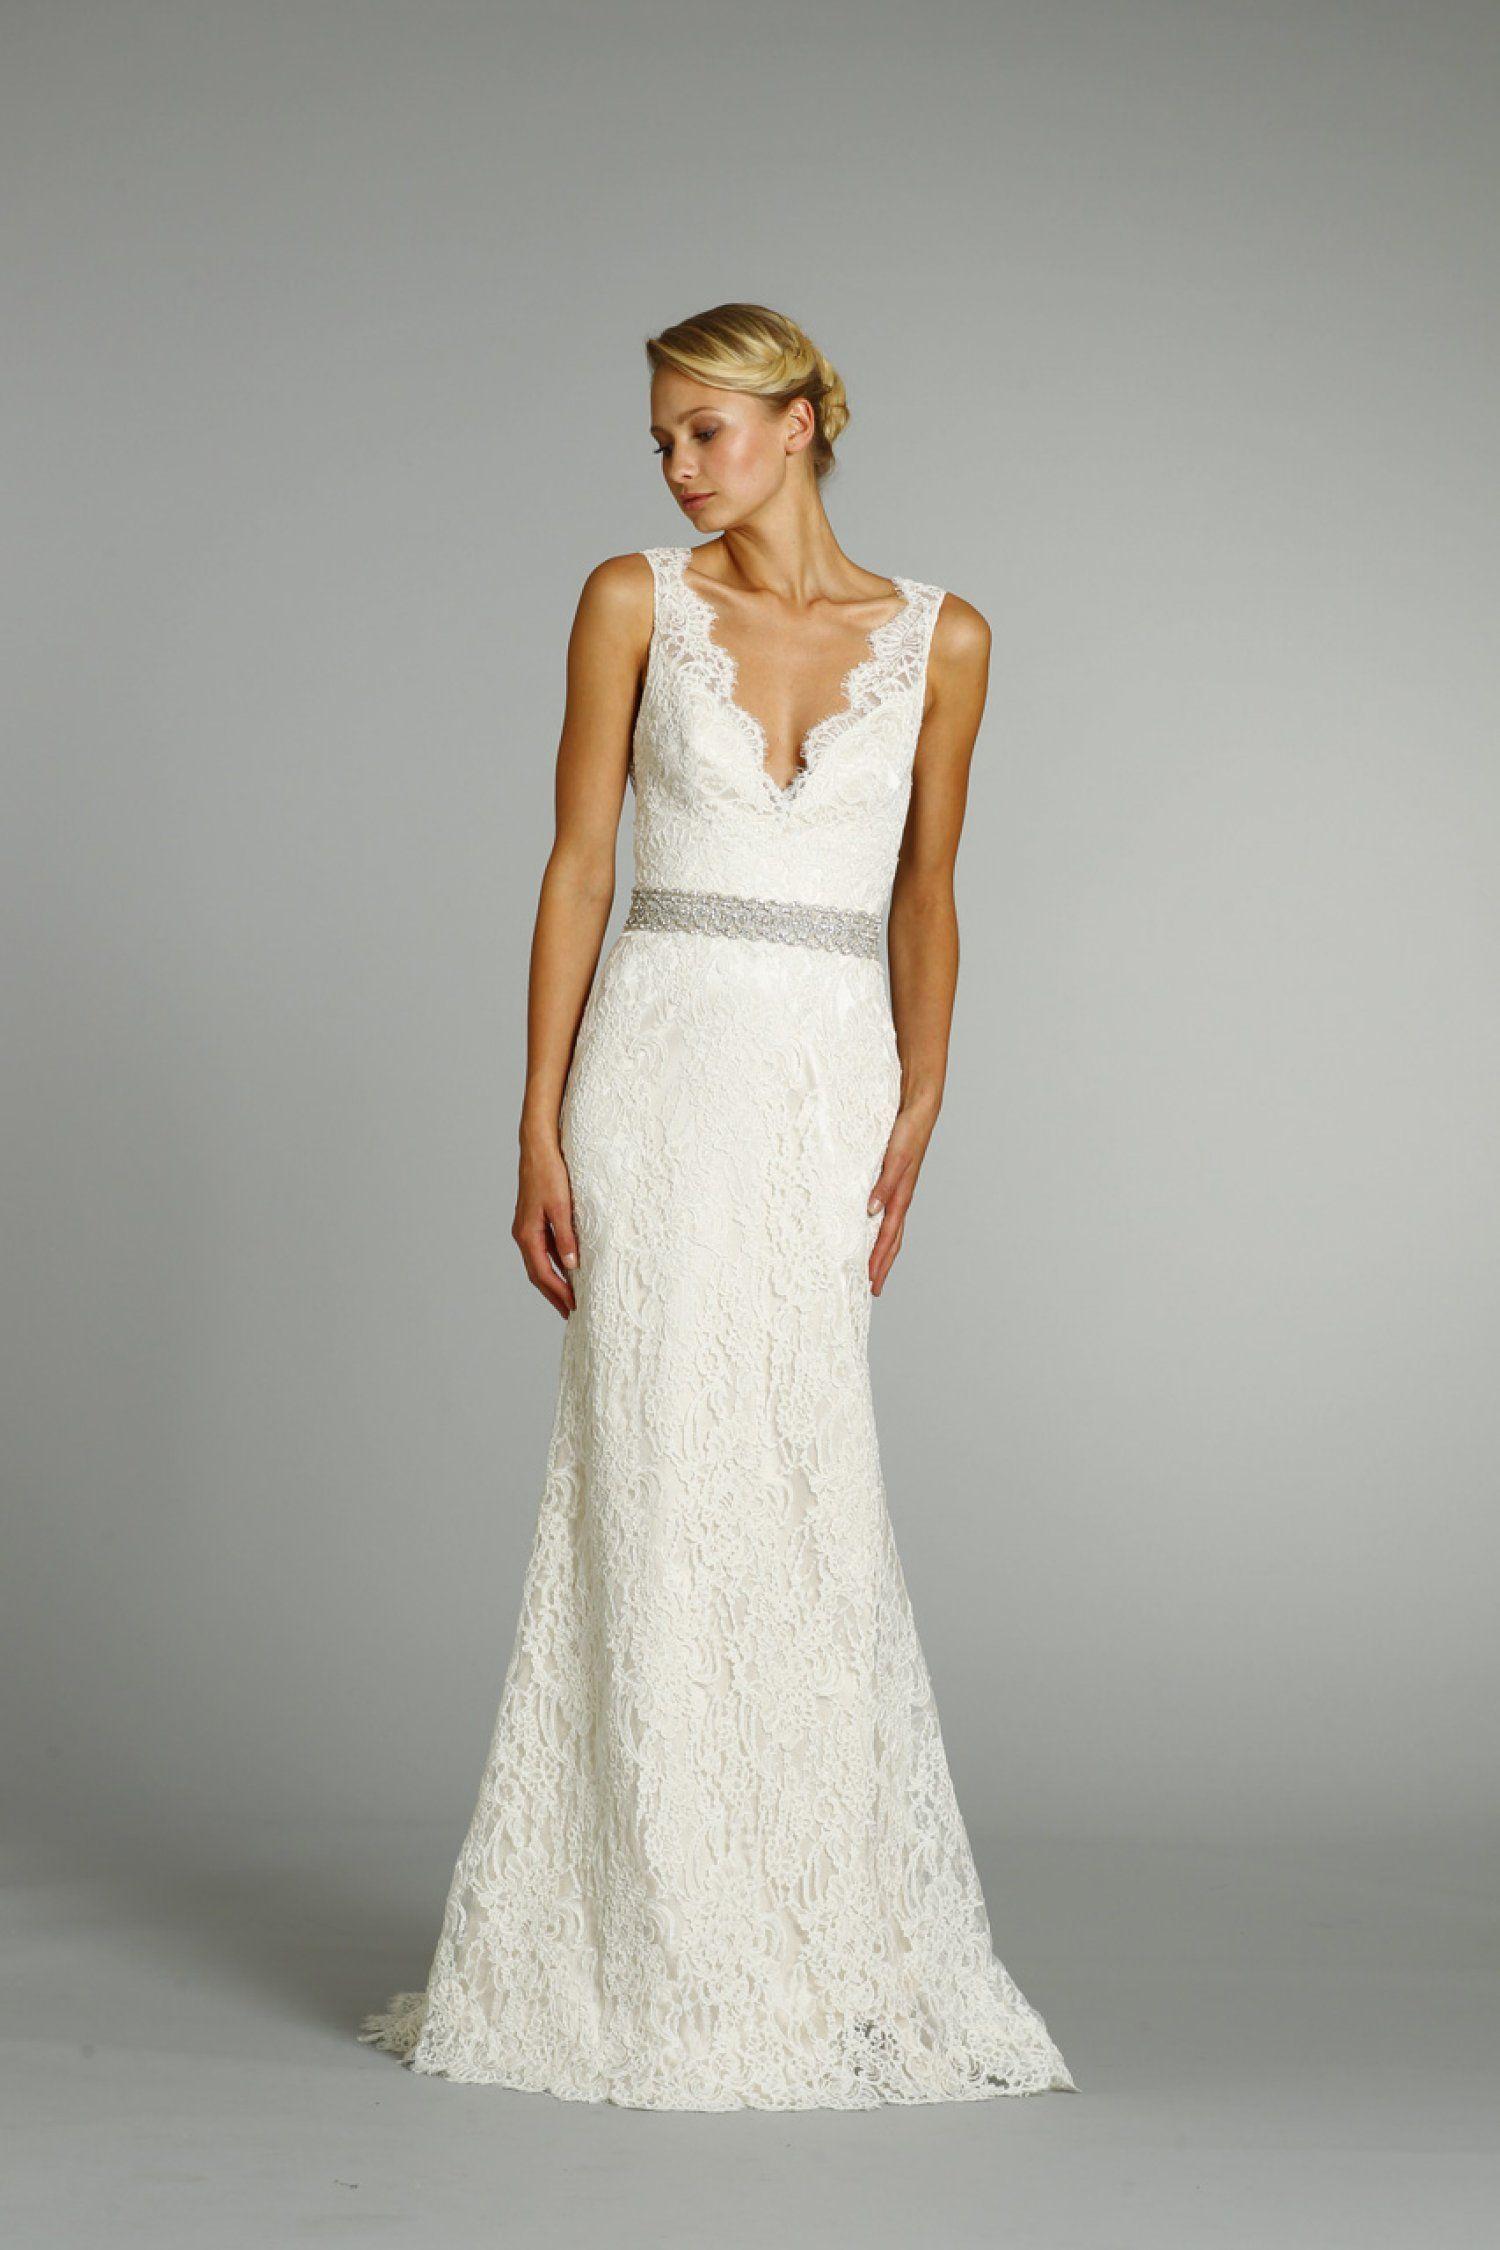 Jim hjelm stillwater minnesota raffine bridal clothes